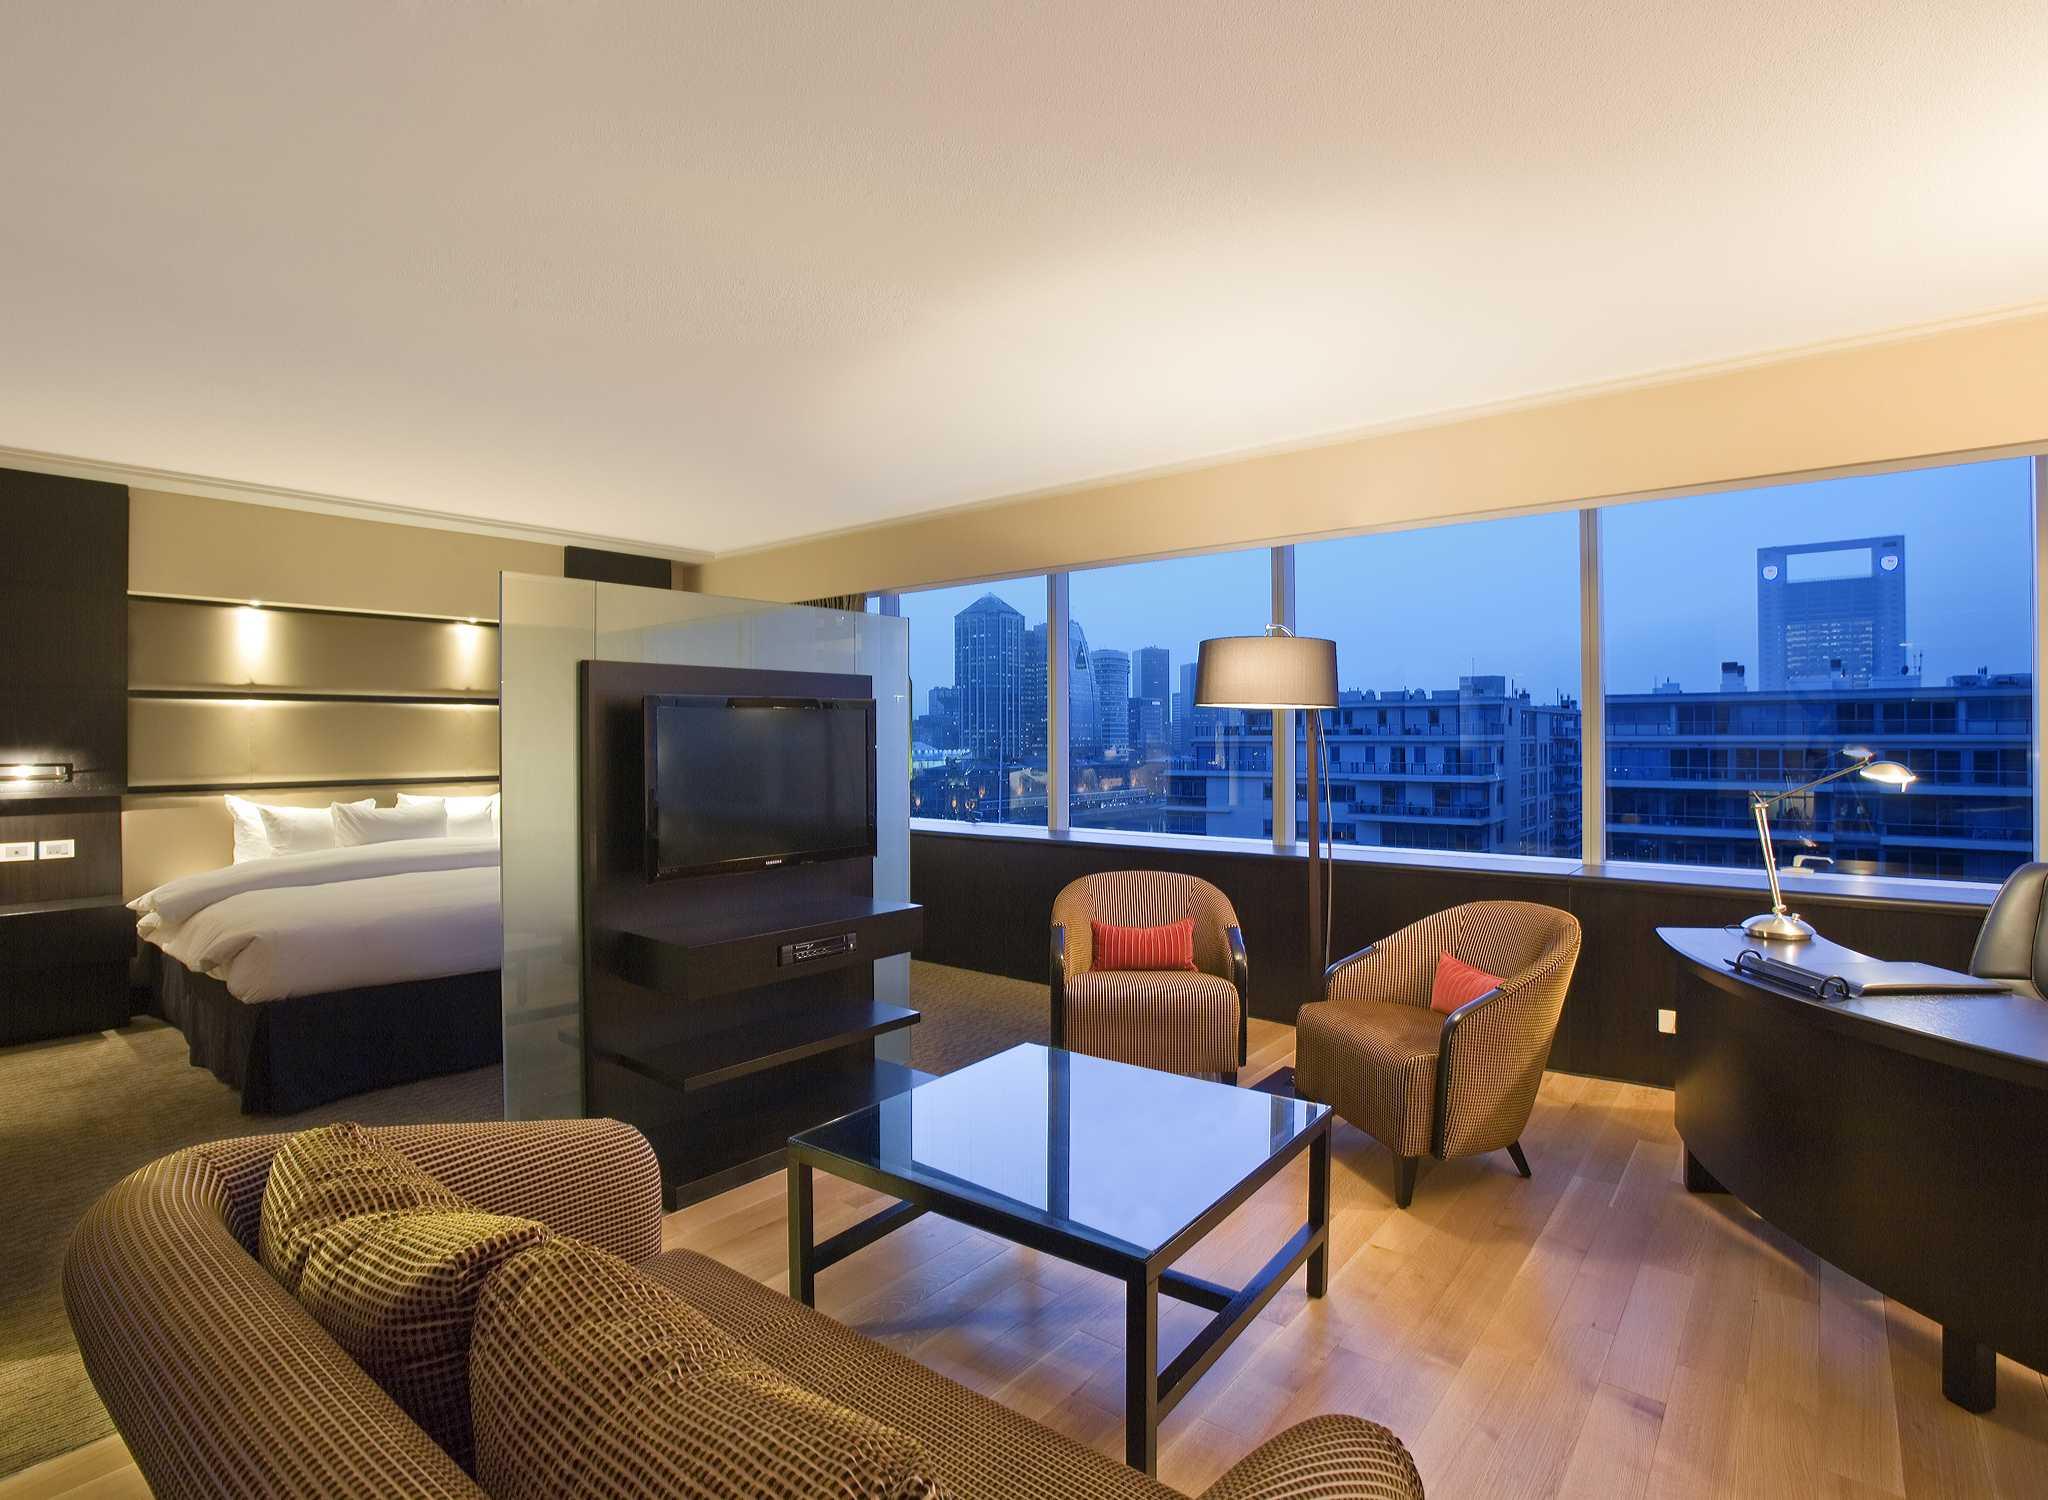 Hoteles en buenos aires hotel hilton buenos aires en for Sala de estar de un hotel